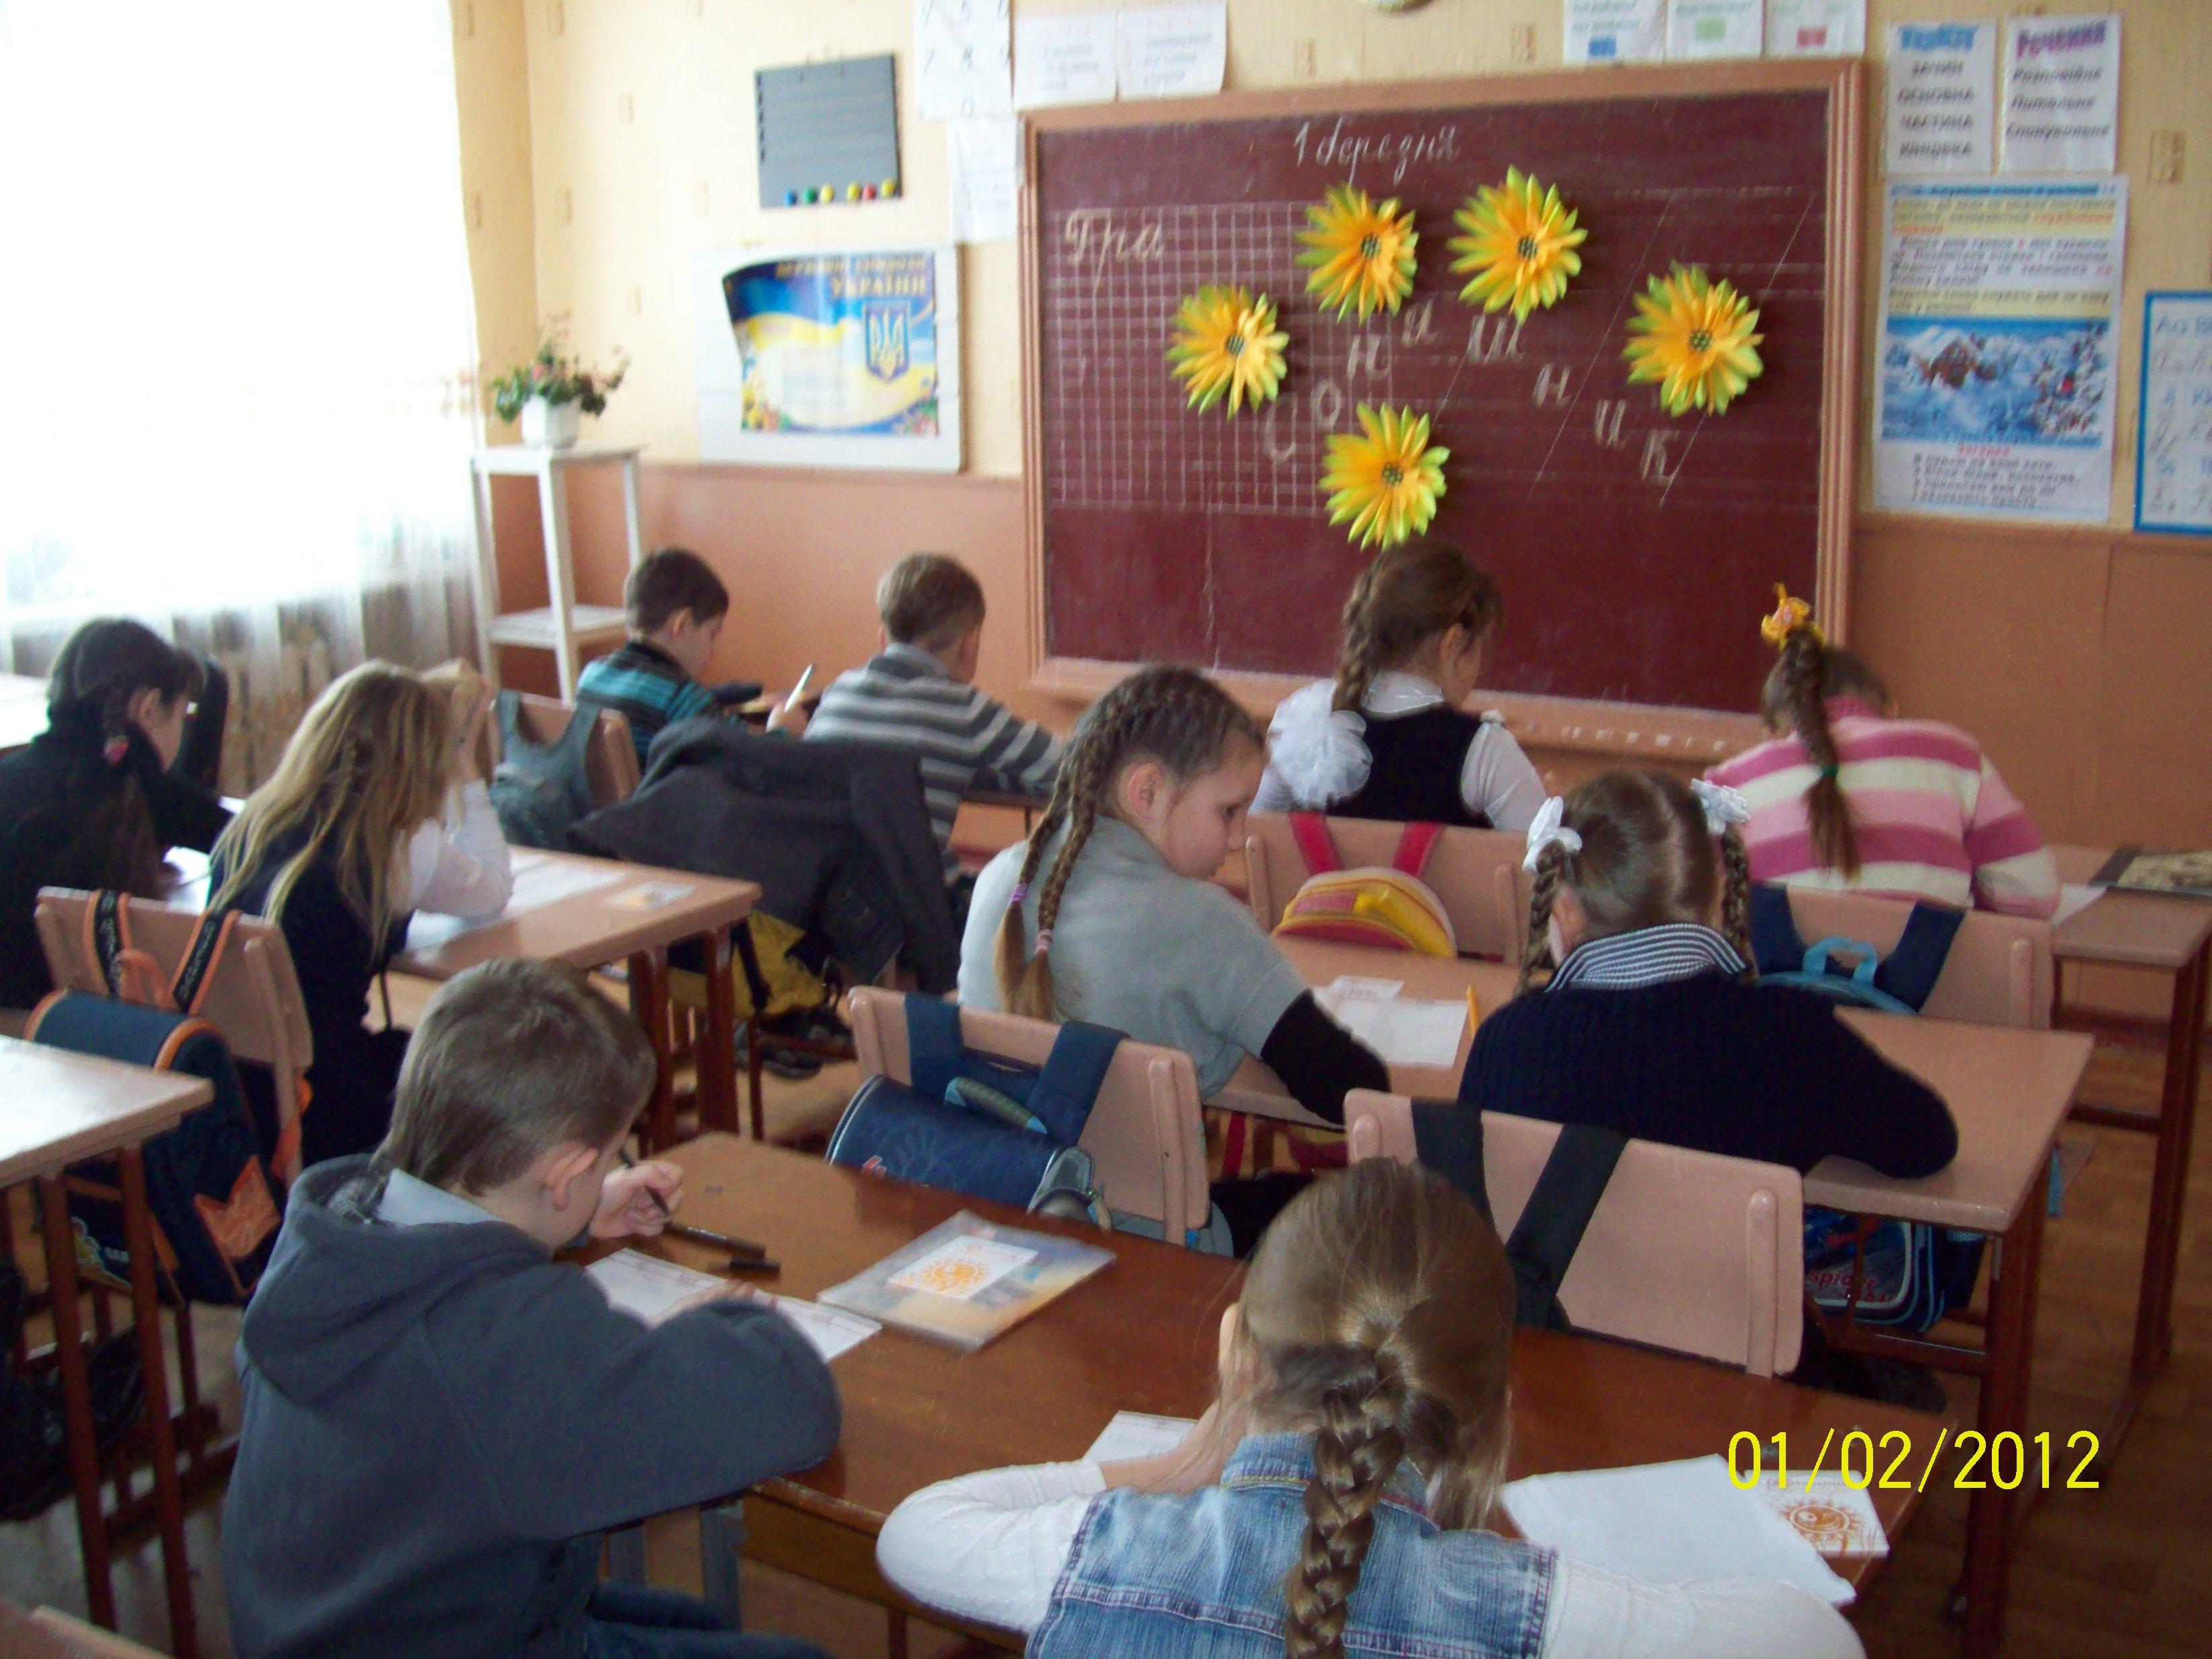 http://school4apost.dnepredu.com/uploads/editor/1500/91761/sitepage_20/101_0289.jpg